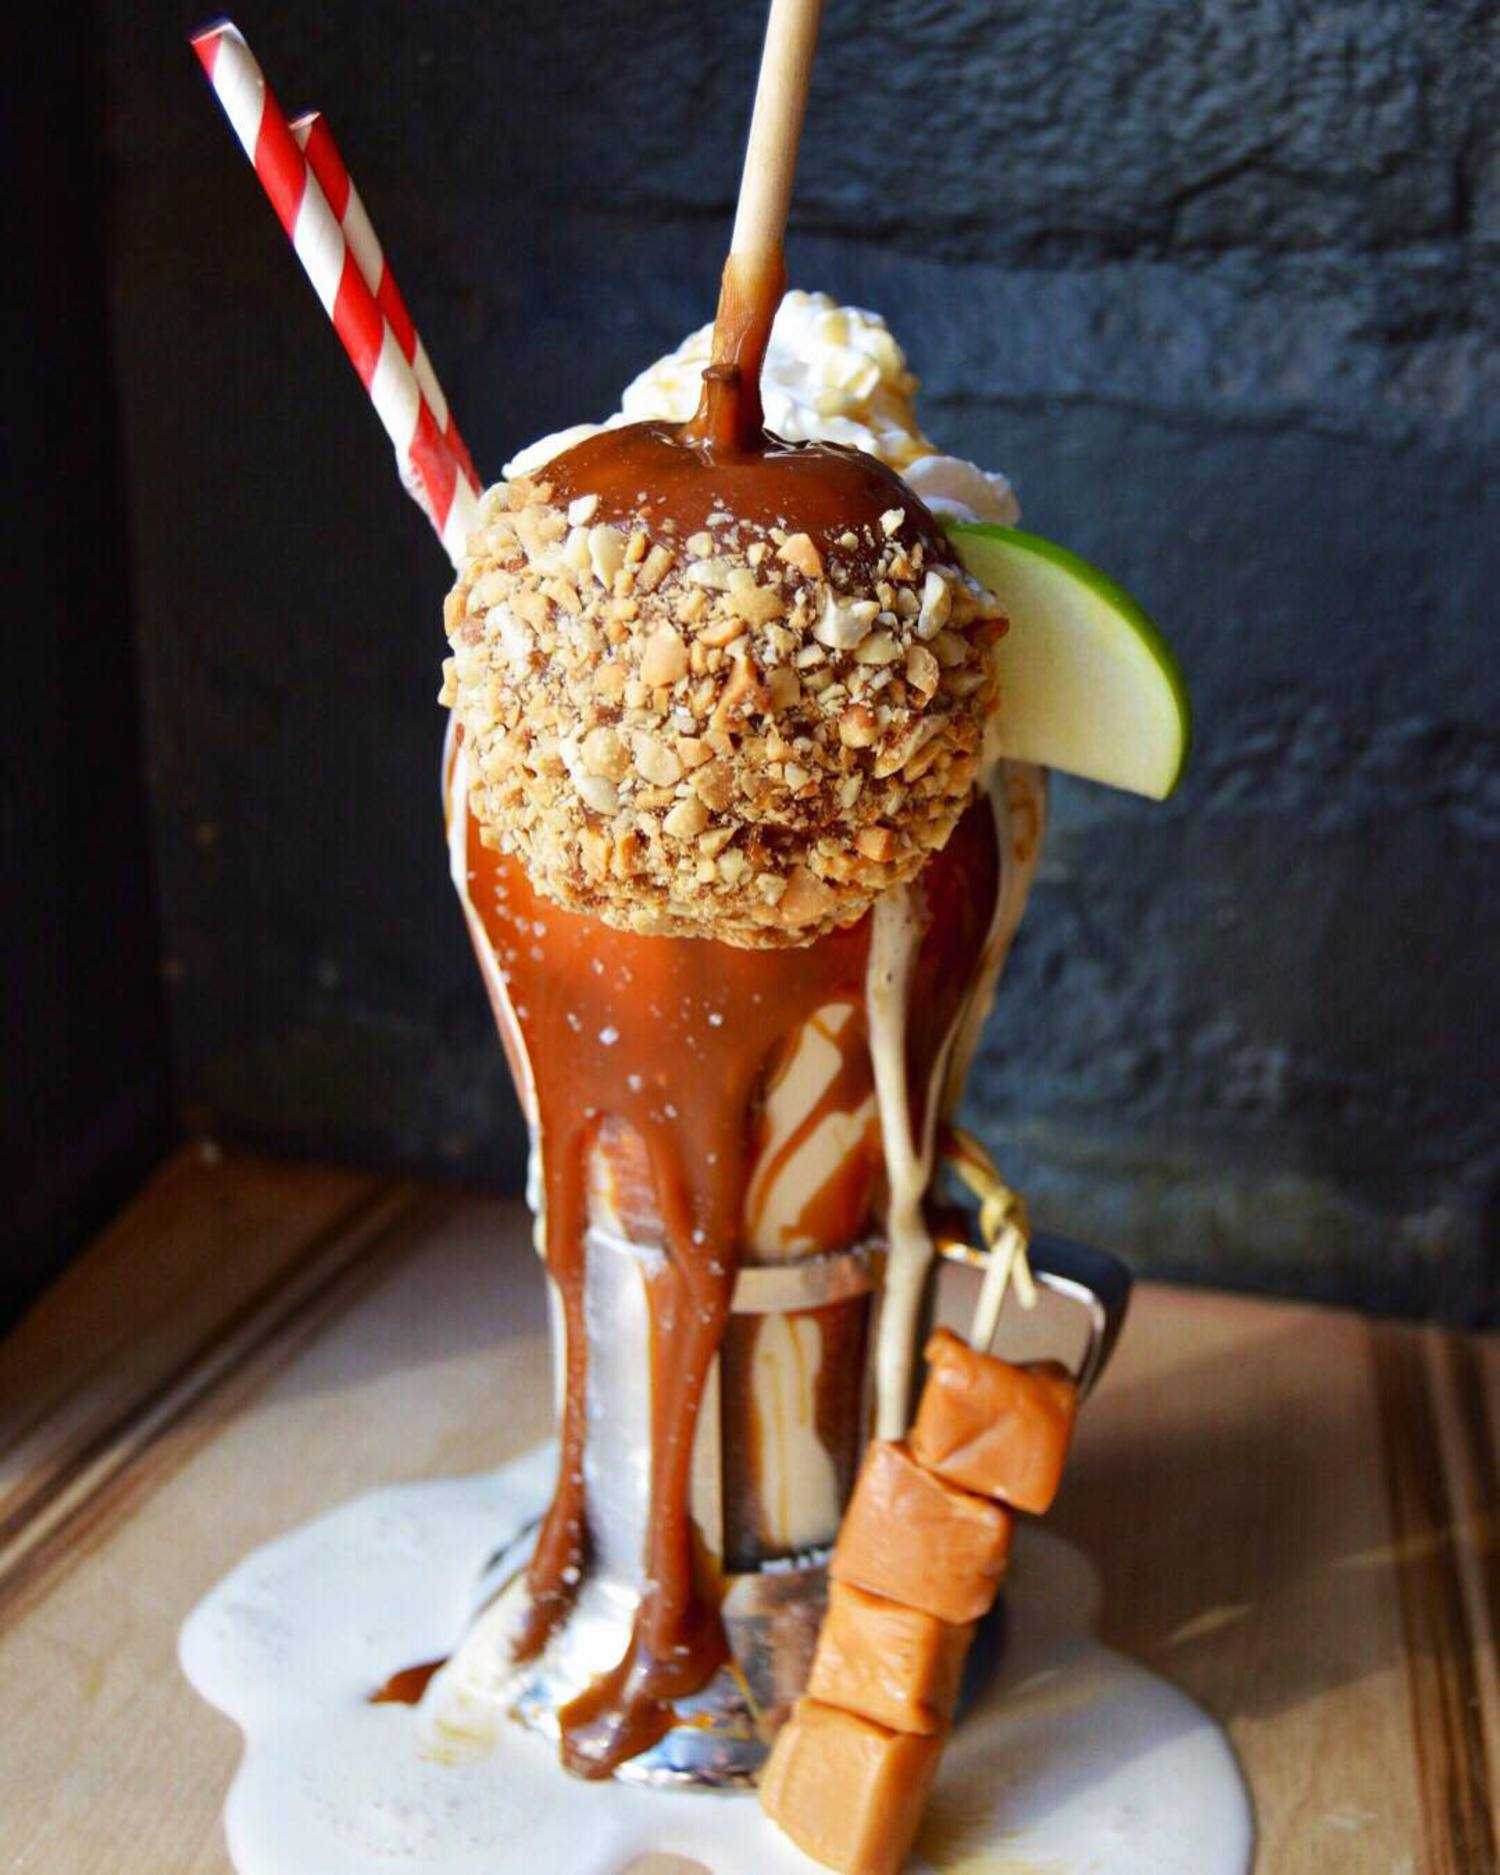 SALTED CARAMEL APPLE. 🍏🐮 #milkshakemonday #caramelapple #shake #foodie #foodporn #yum #desert #blacktapthat #blacktapnyc #burger #NYC #fall